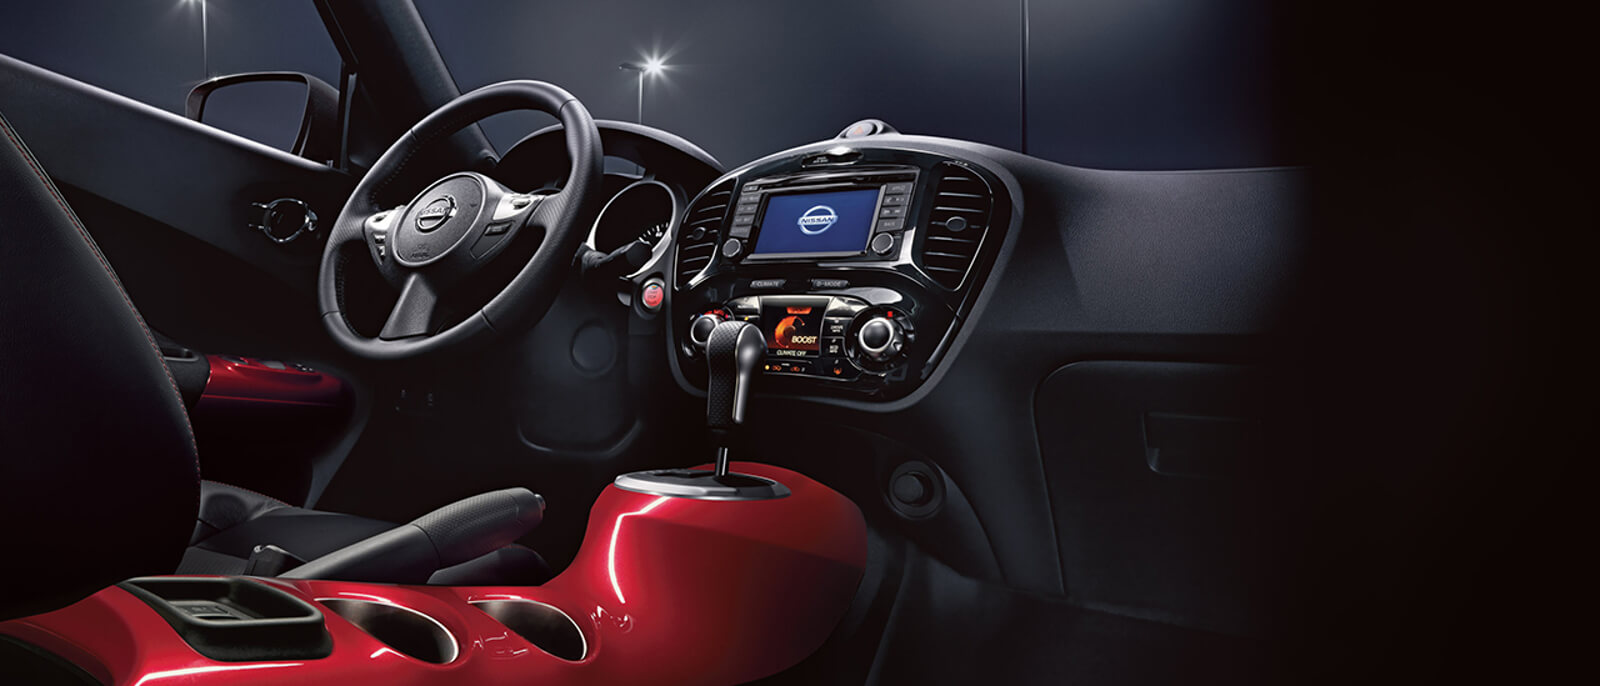 2017 Nissan Juke center console